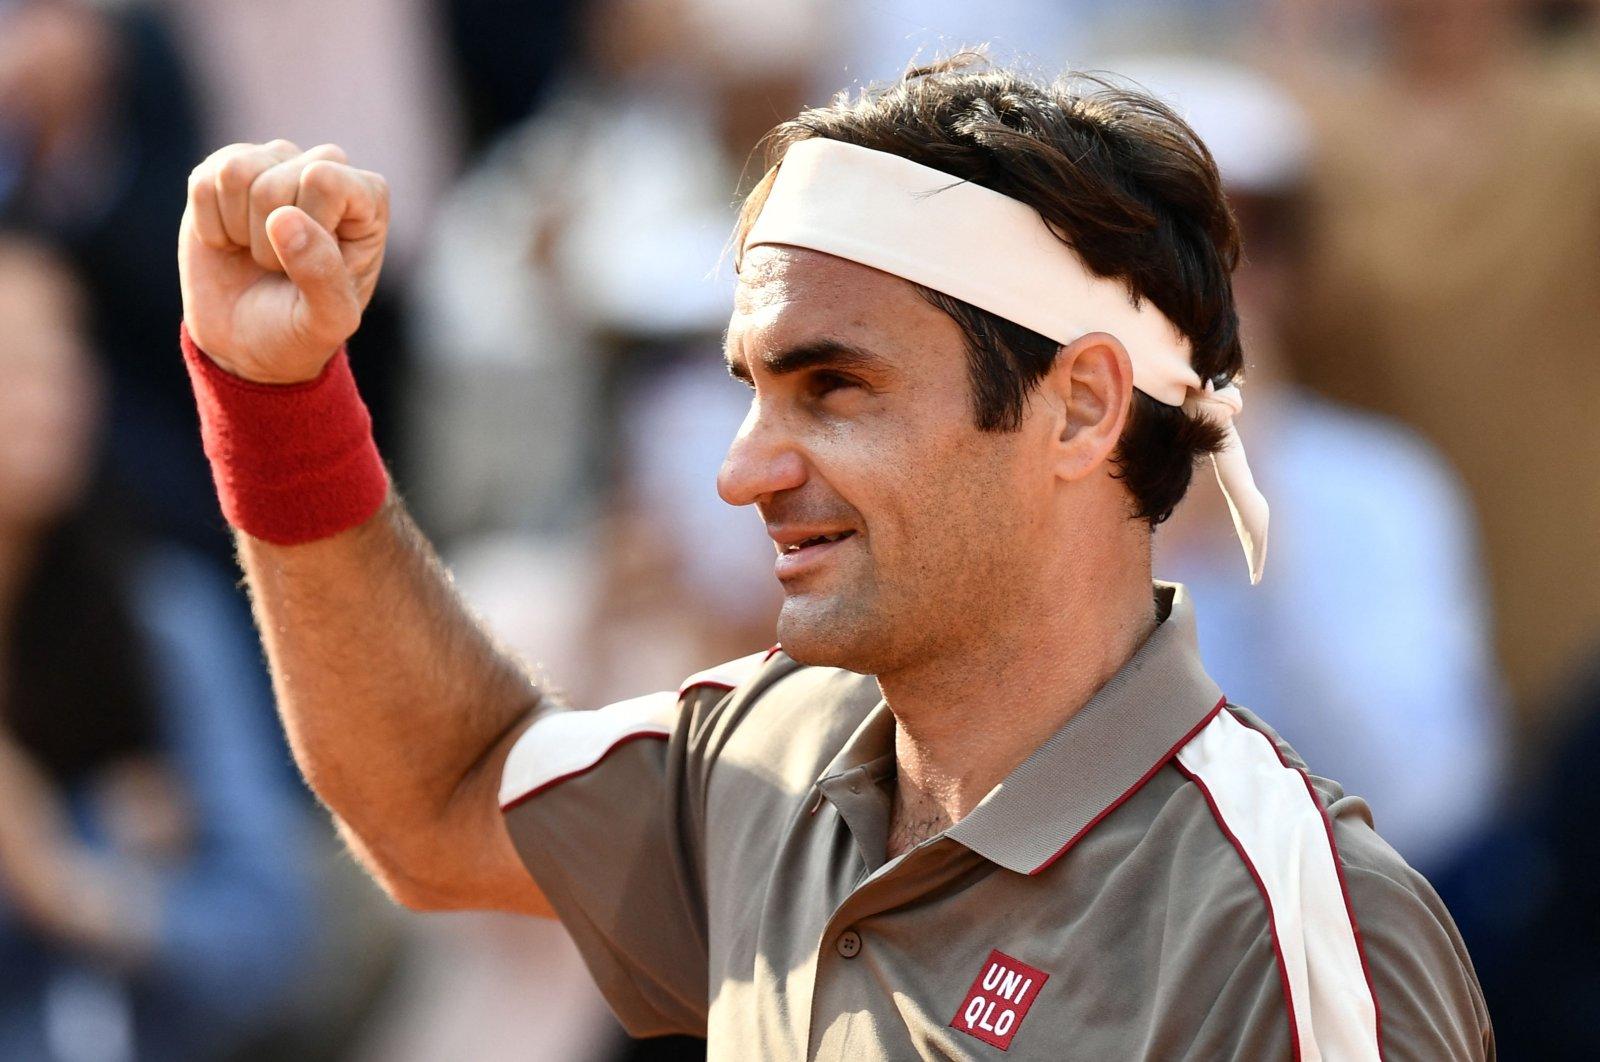 Switzerland's Roger Federer celebrates after winning against Switzerland's Stanislas Wawrinka during their men's singles quarter-final match on day 10 of The Roland Garros 2019 French Open tennis tournament in Paris, June 04, 2019. (AFP Photo)